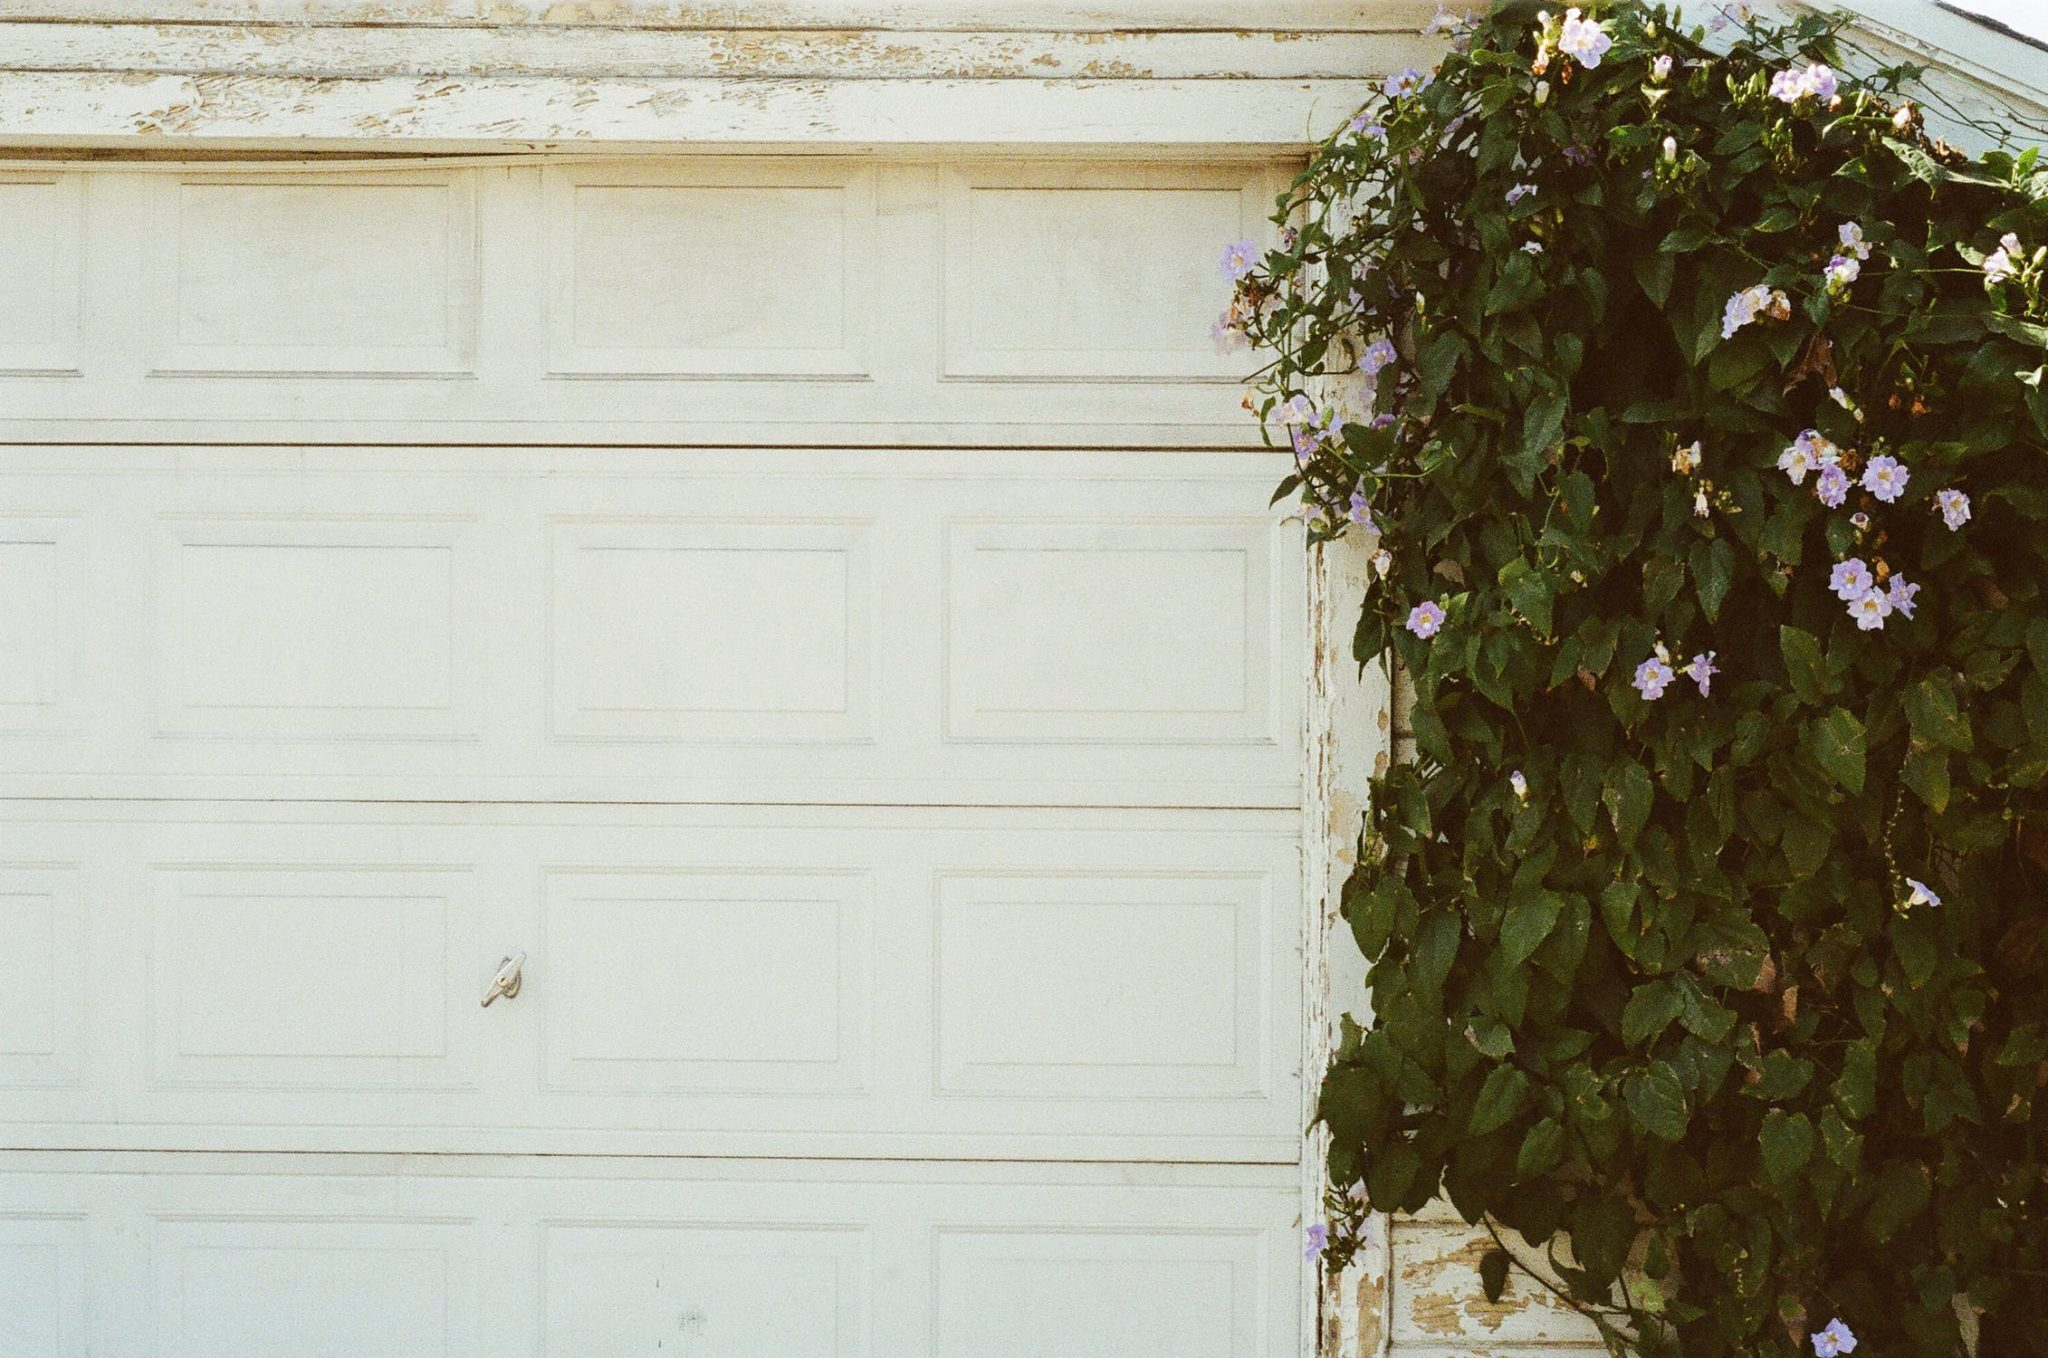 garage verbouwing architect nodig